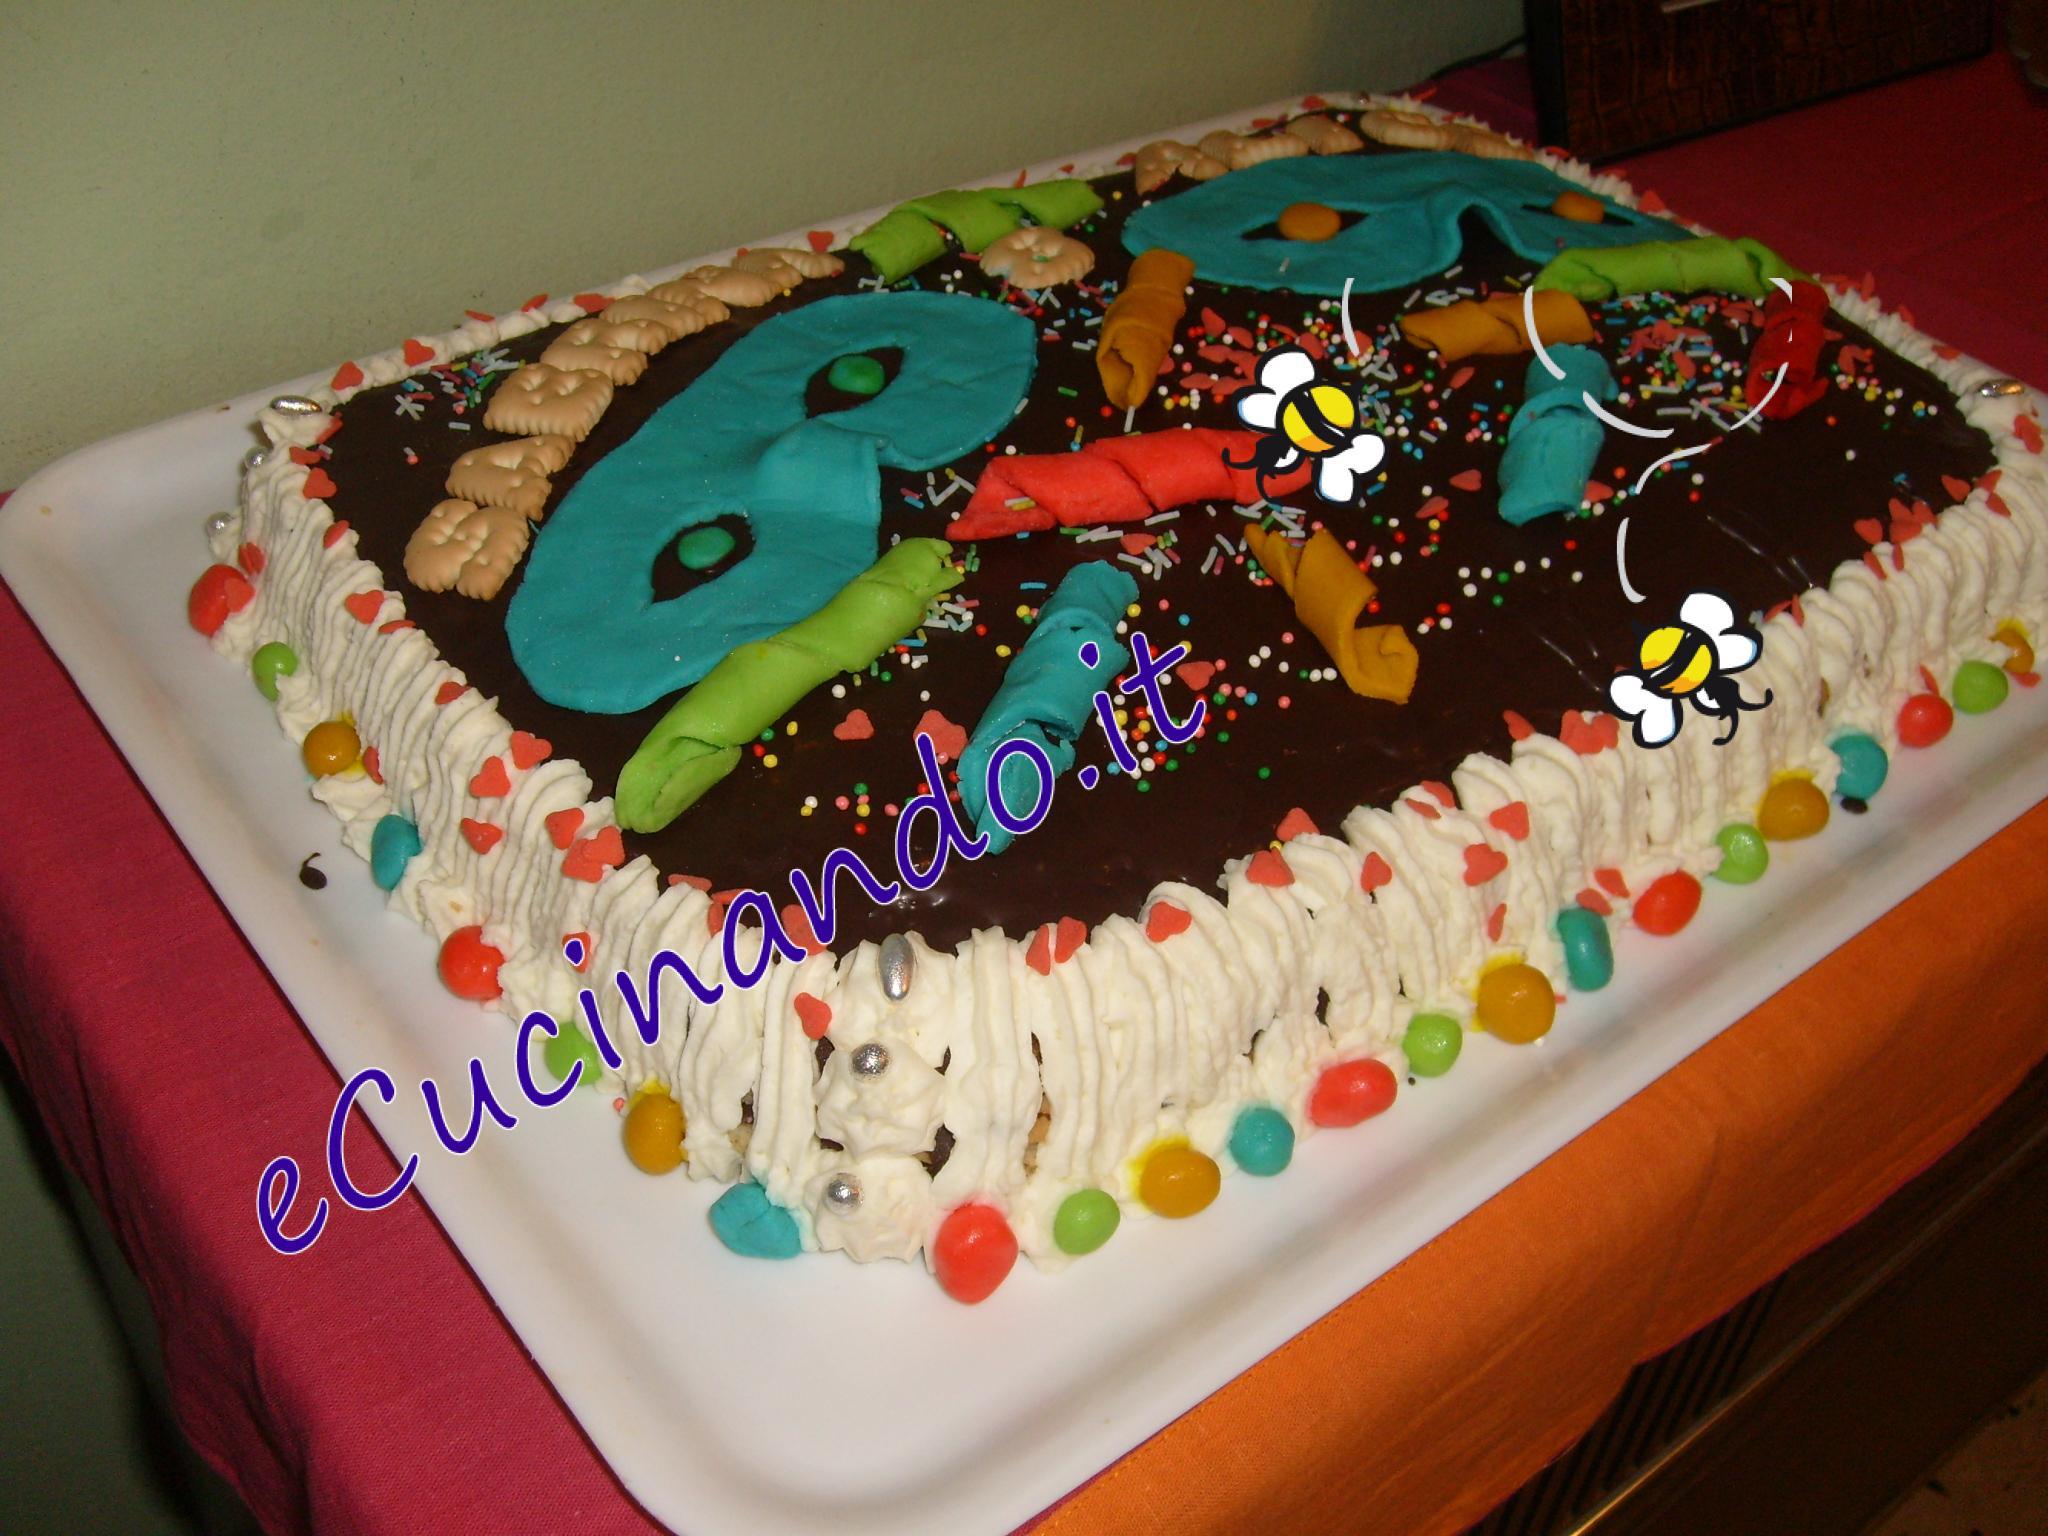 Torta compleanno per carnevale - Decorazioni per torte di carnevale ...